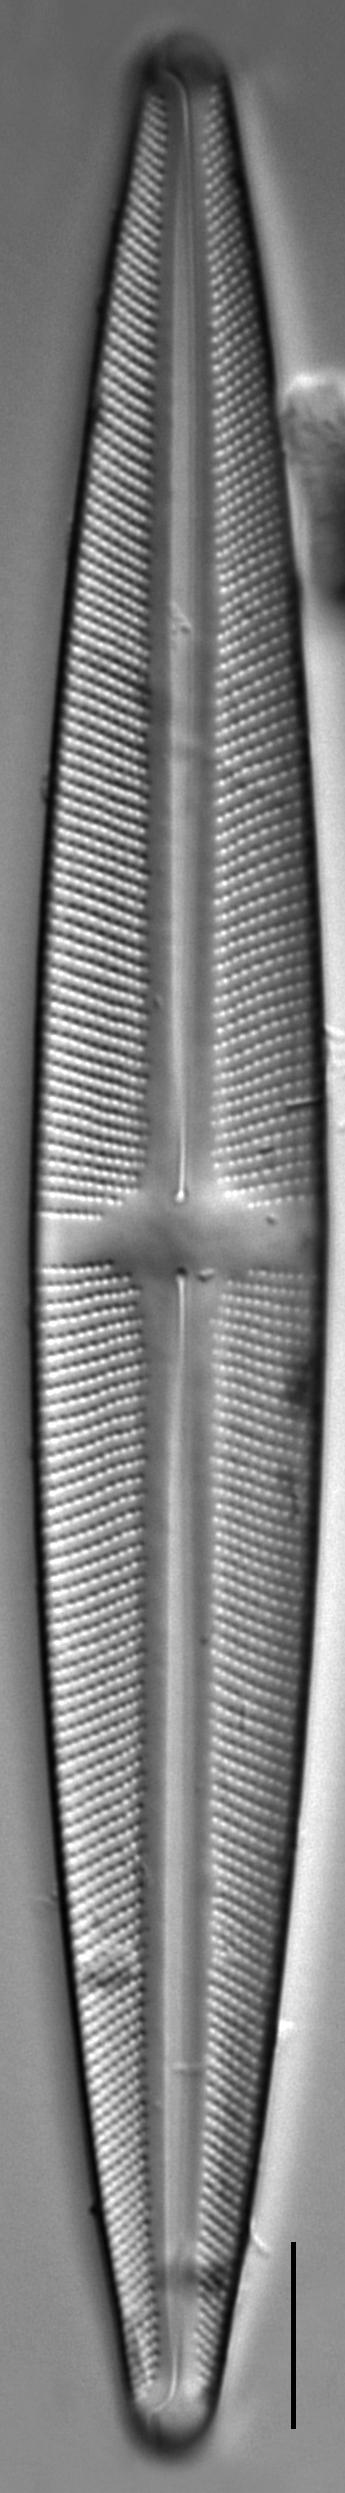 Stauroneis kingstonii LM4